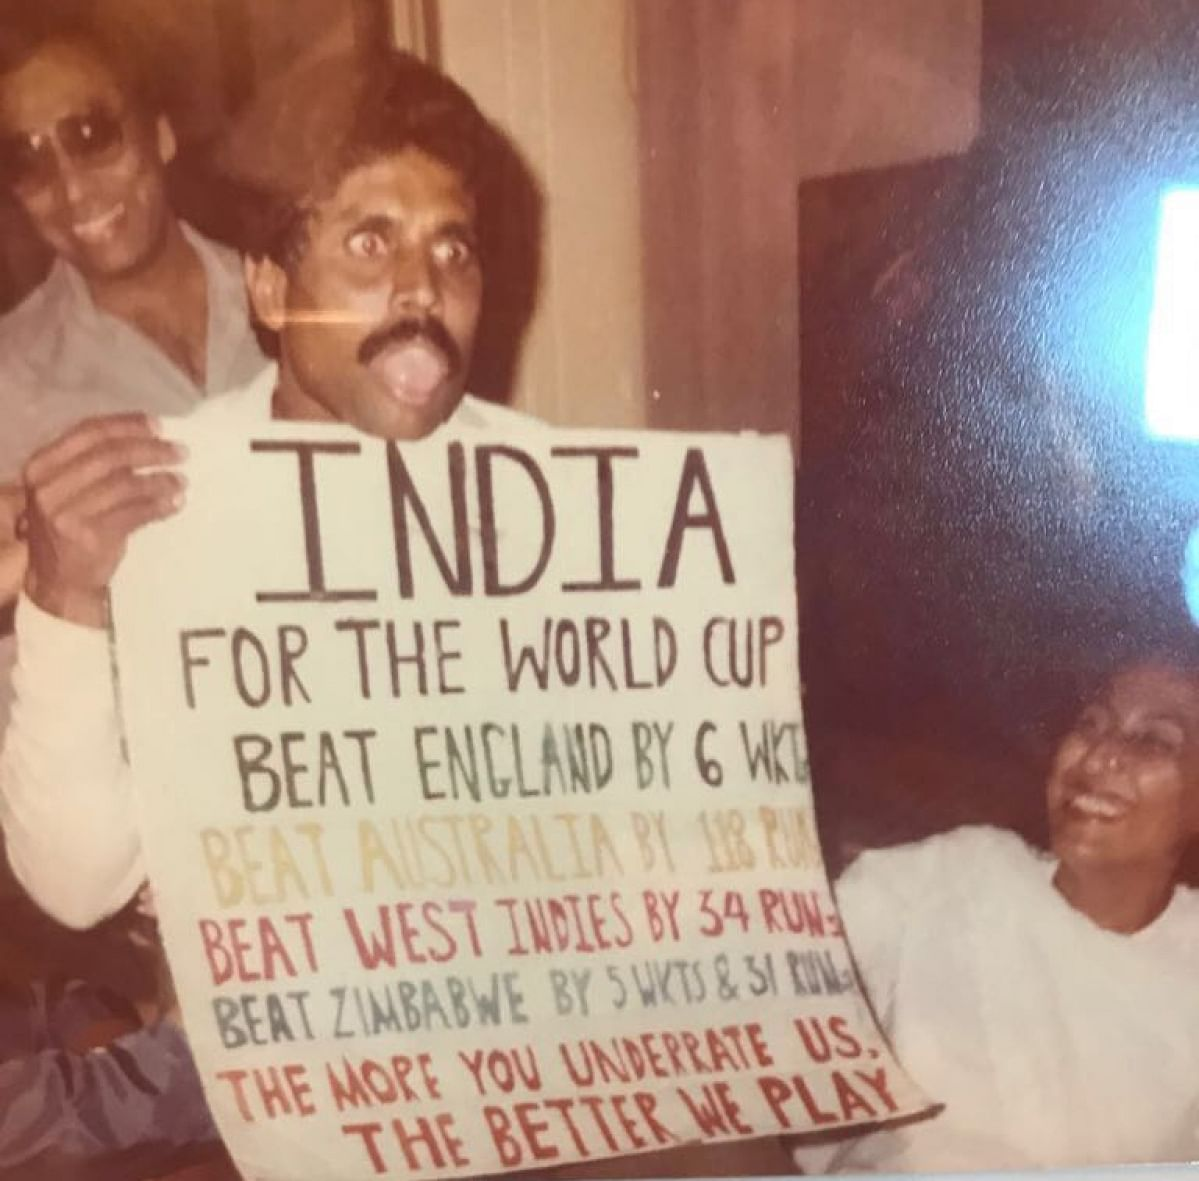 Captain Kapil Dev (left) celebrating India's 1983 World Cup win.